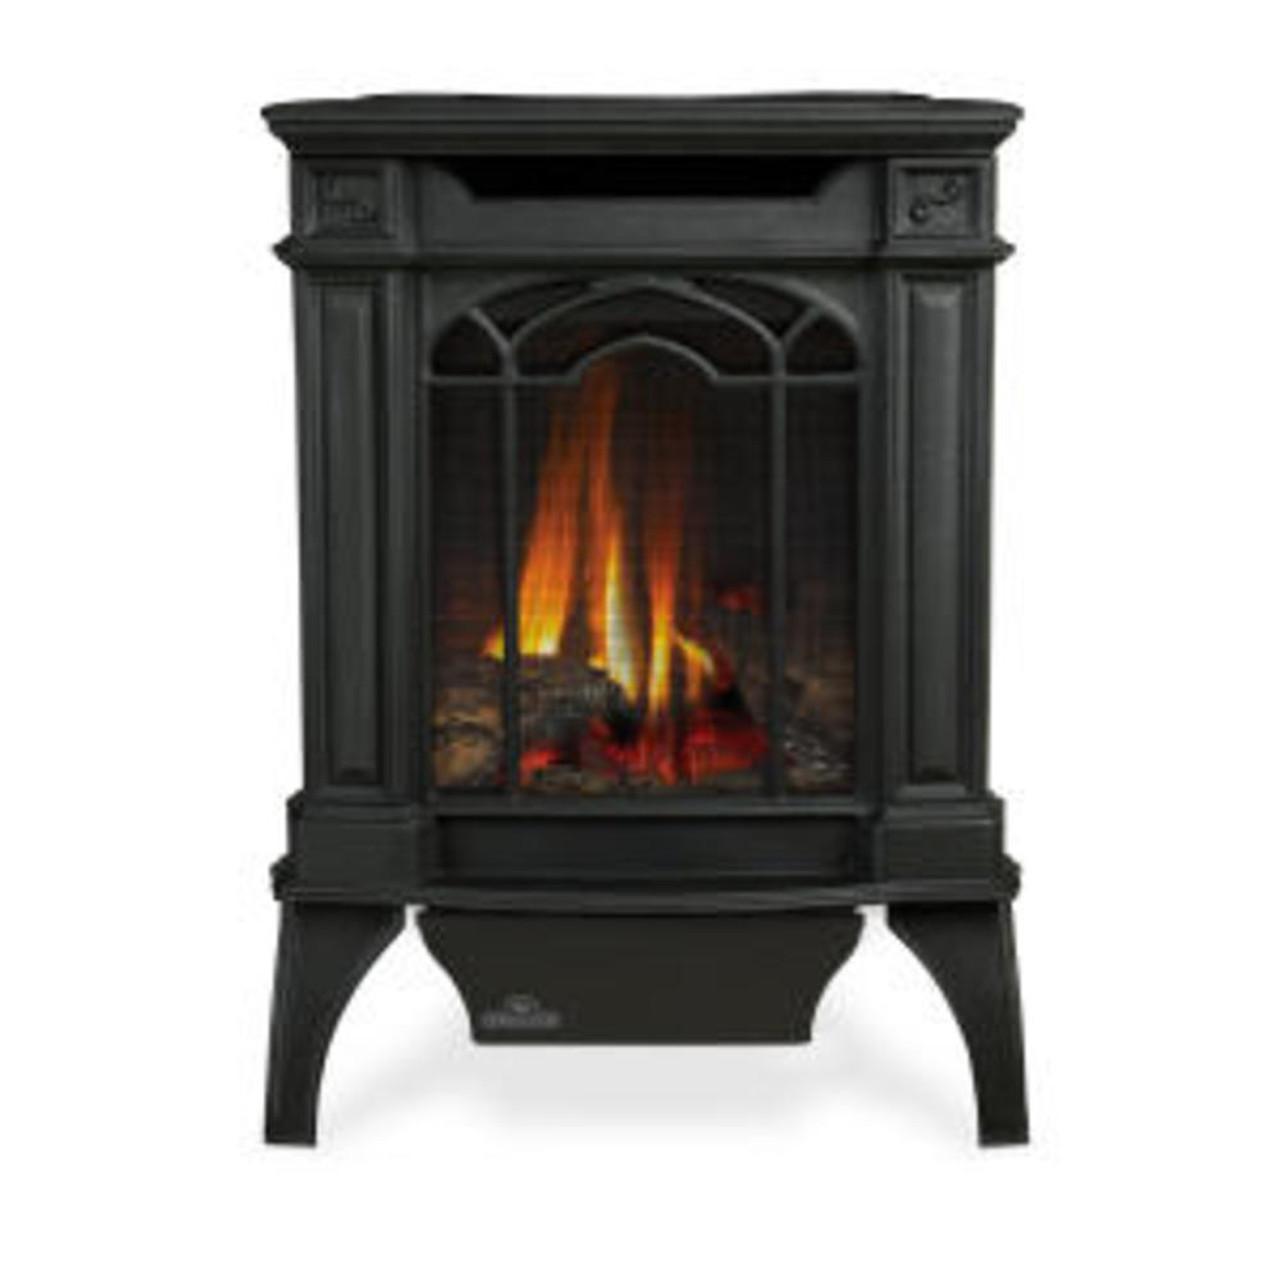 Napoleon Arlington™ Cast Iron Direct Vent Gas Fireplace - Millivolt Ignition | Metallic Black